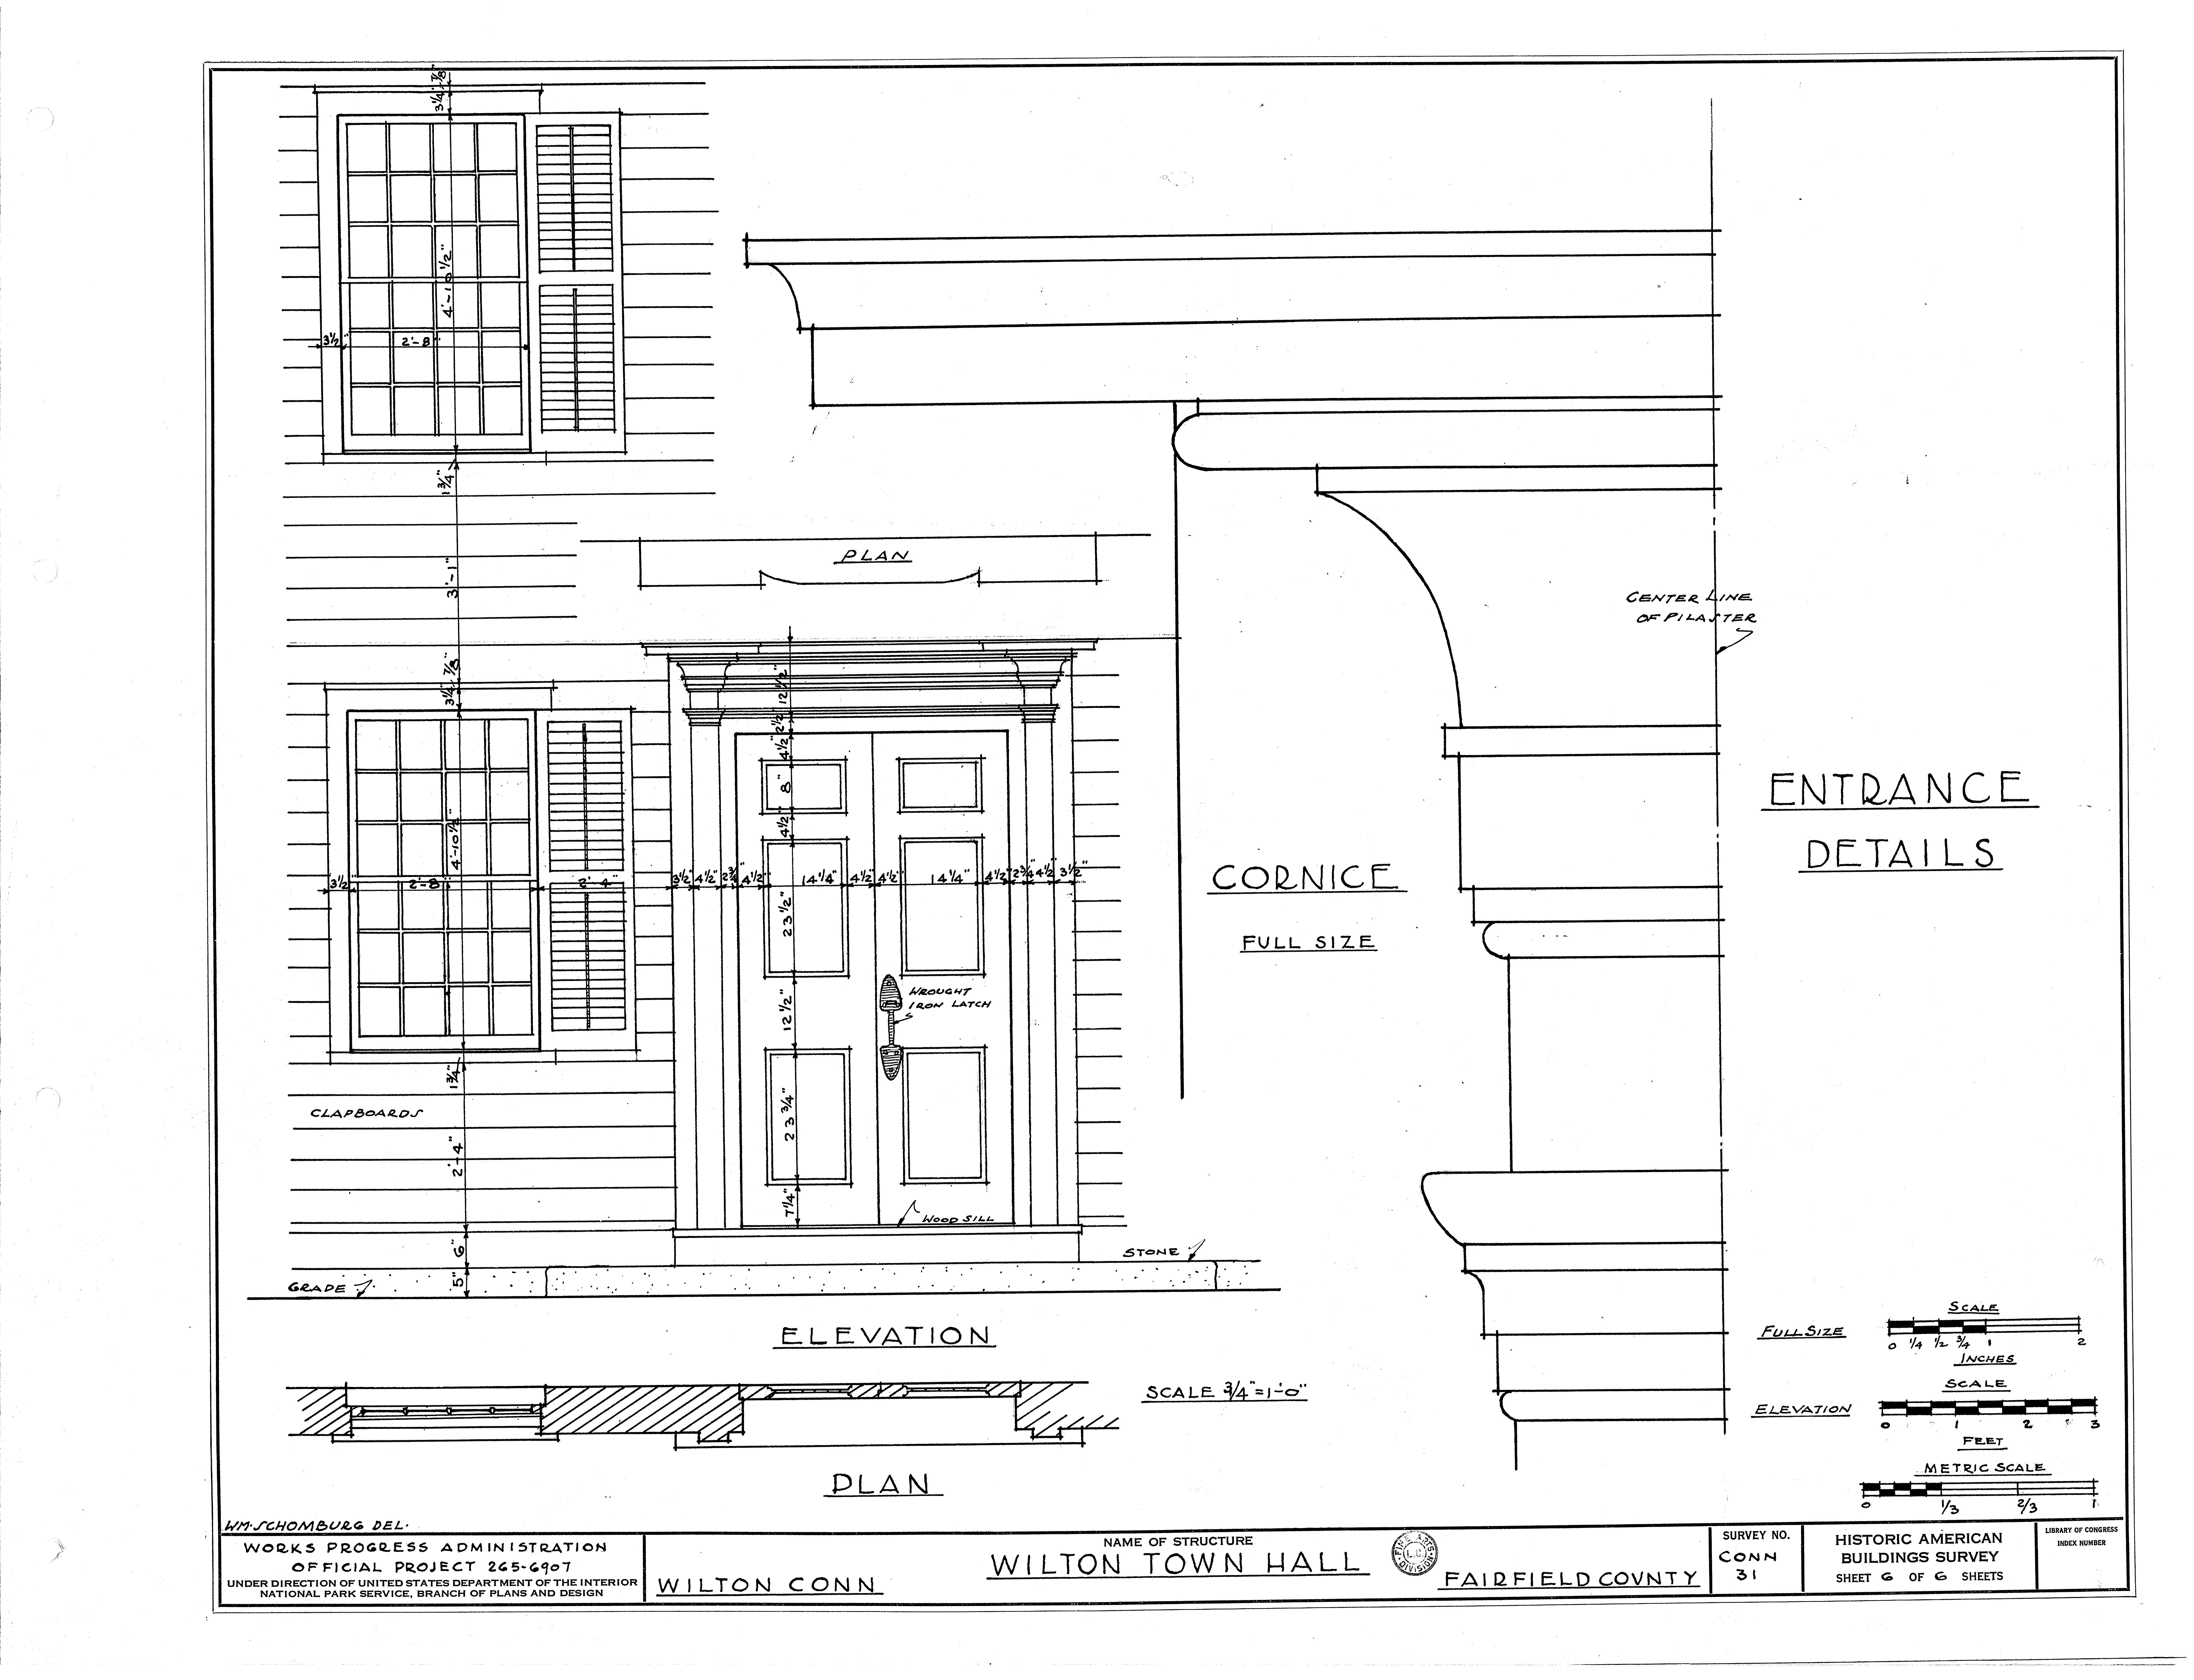 File:Wilton Town Hall, Wilton, Fairfield County, CT HABS